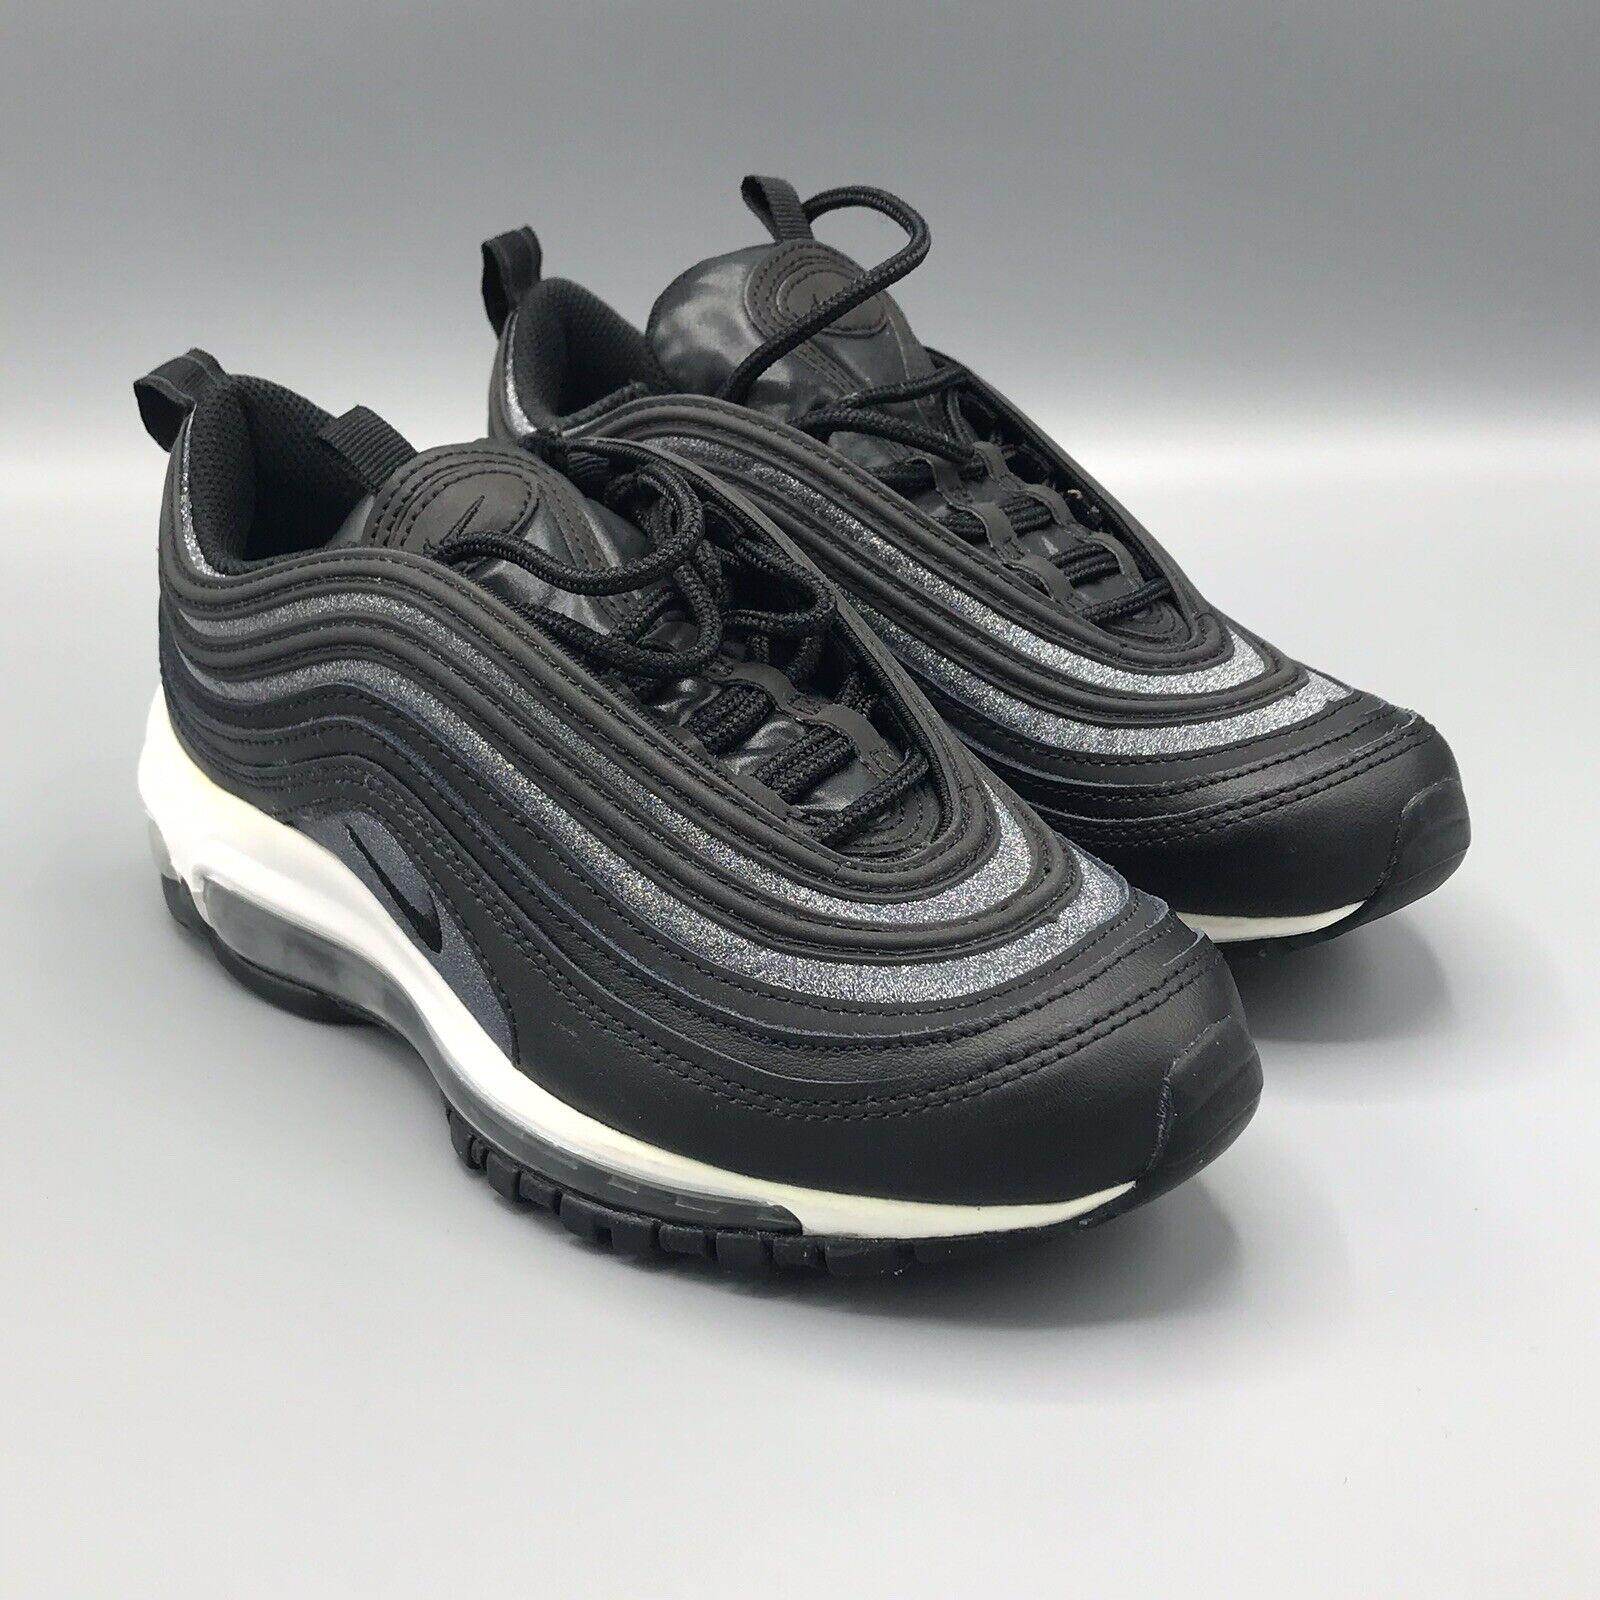 Women's Nike Air Max 97 size 5.5 Black Black-White AT0071-002